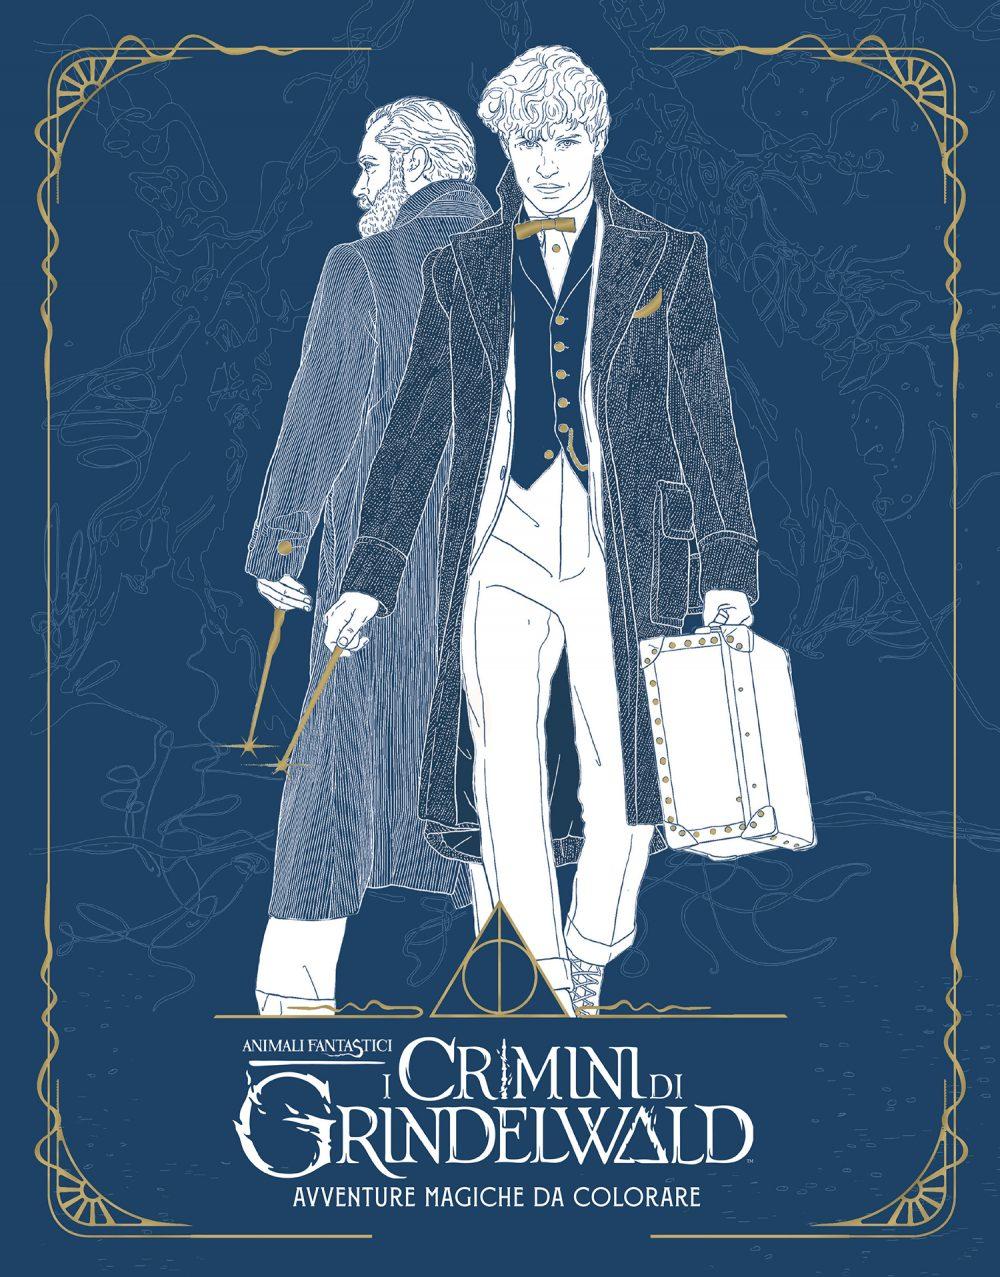 Animali Fantastici I Crimini Di Grindelwald Ecco I Volumi Che